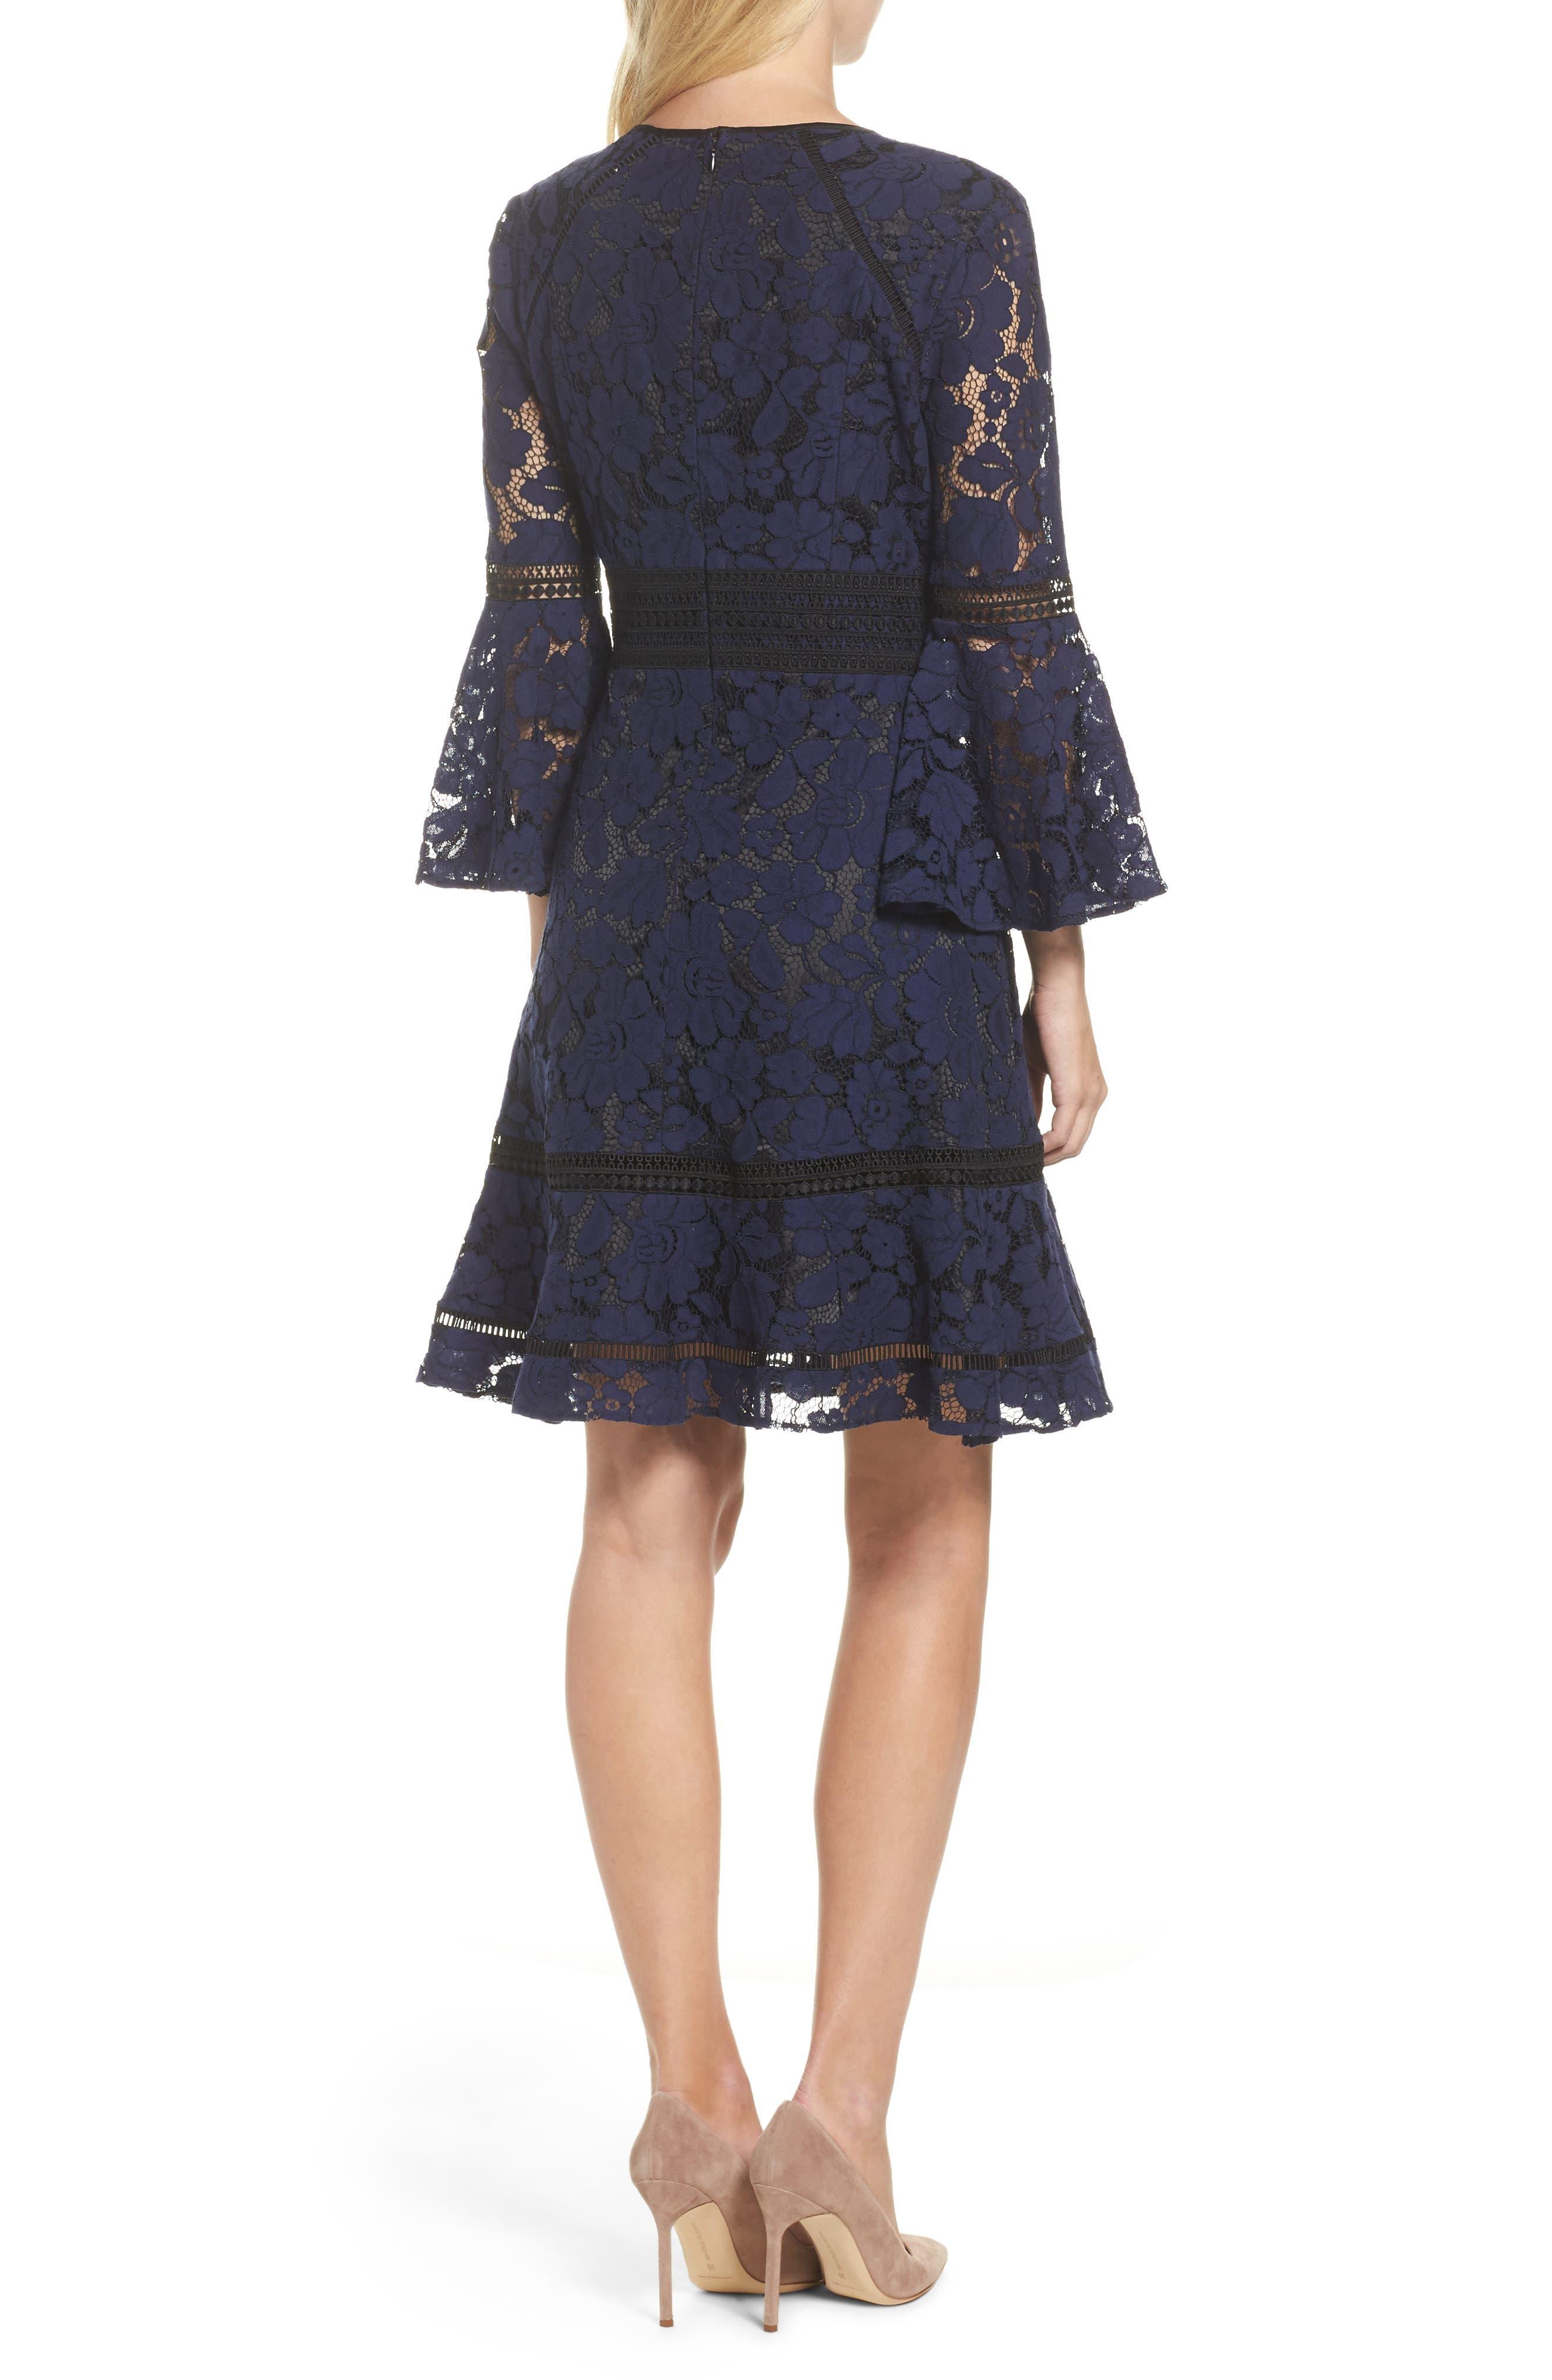 Bell Sleeve Lace Dress,                             Alternate thumbnail 2, color,                             Navy/ Black